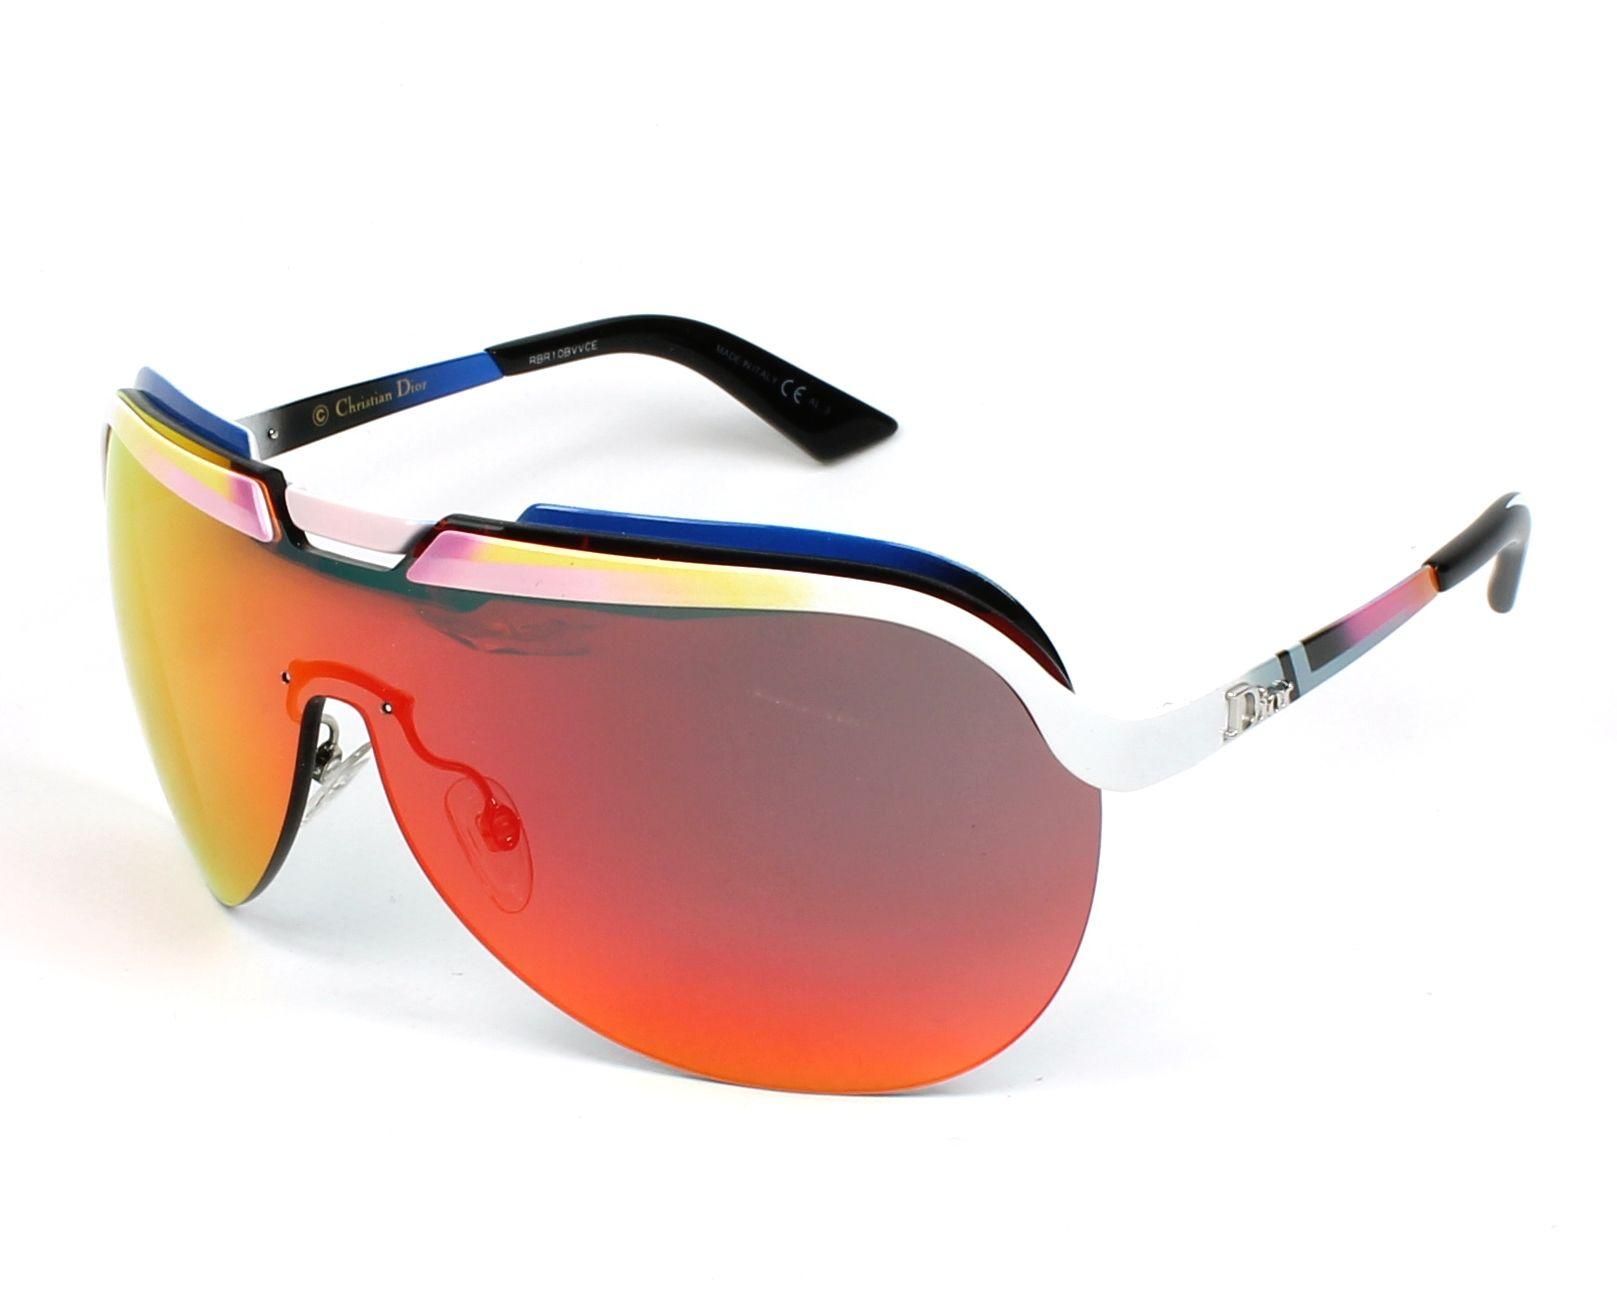 6cedbbc2bef6 Christian Dior Sunglasses Warranty